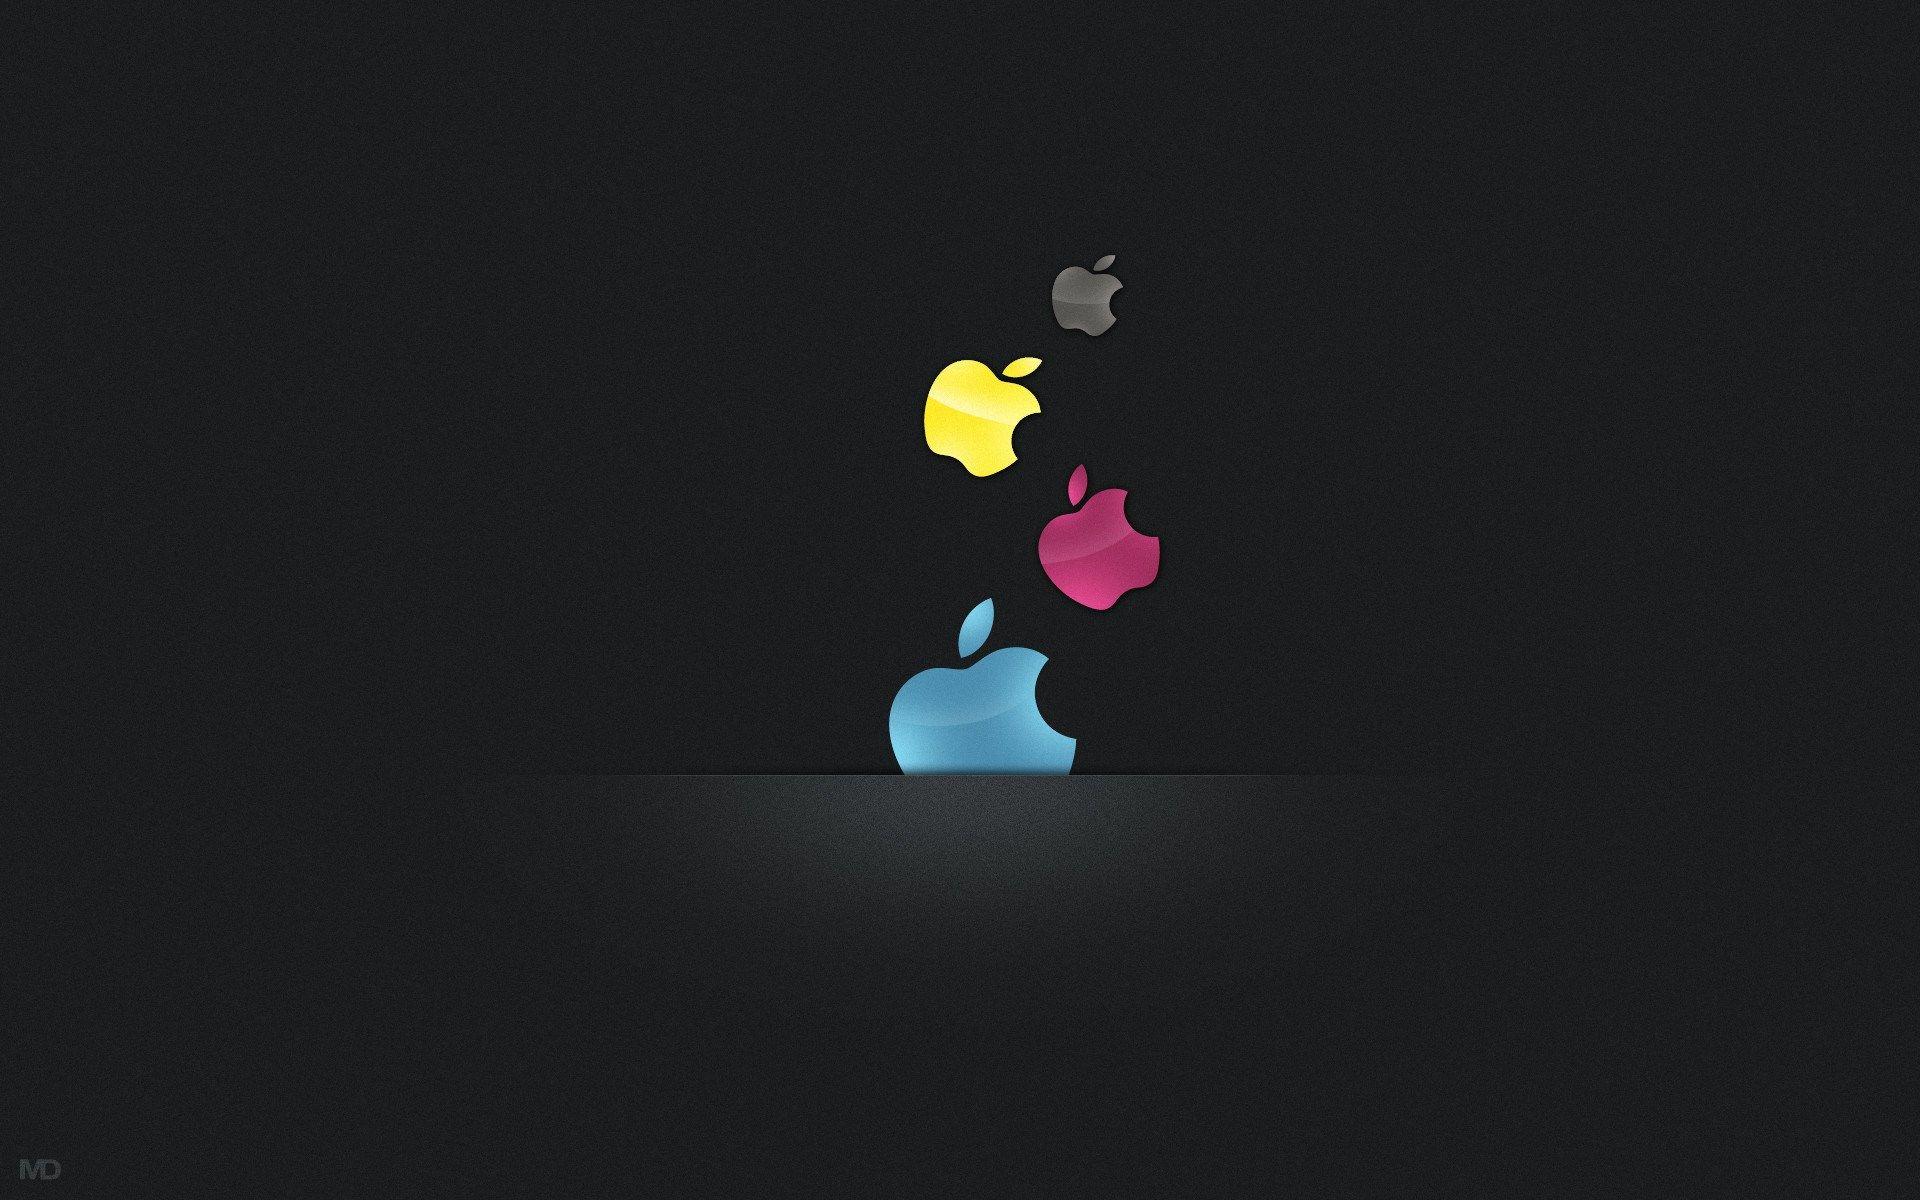 Apple Late Backgrounds Desktop Apple Wallpaper Apple Logo Wallpaper Hd Apple Wallpapers